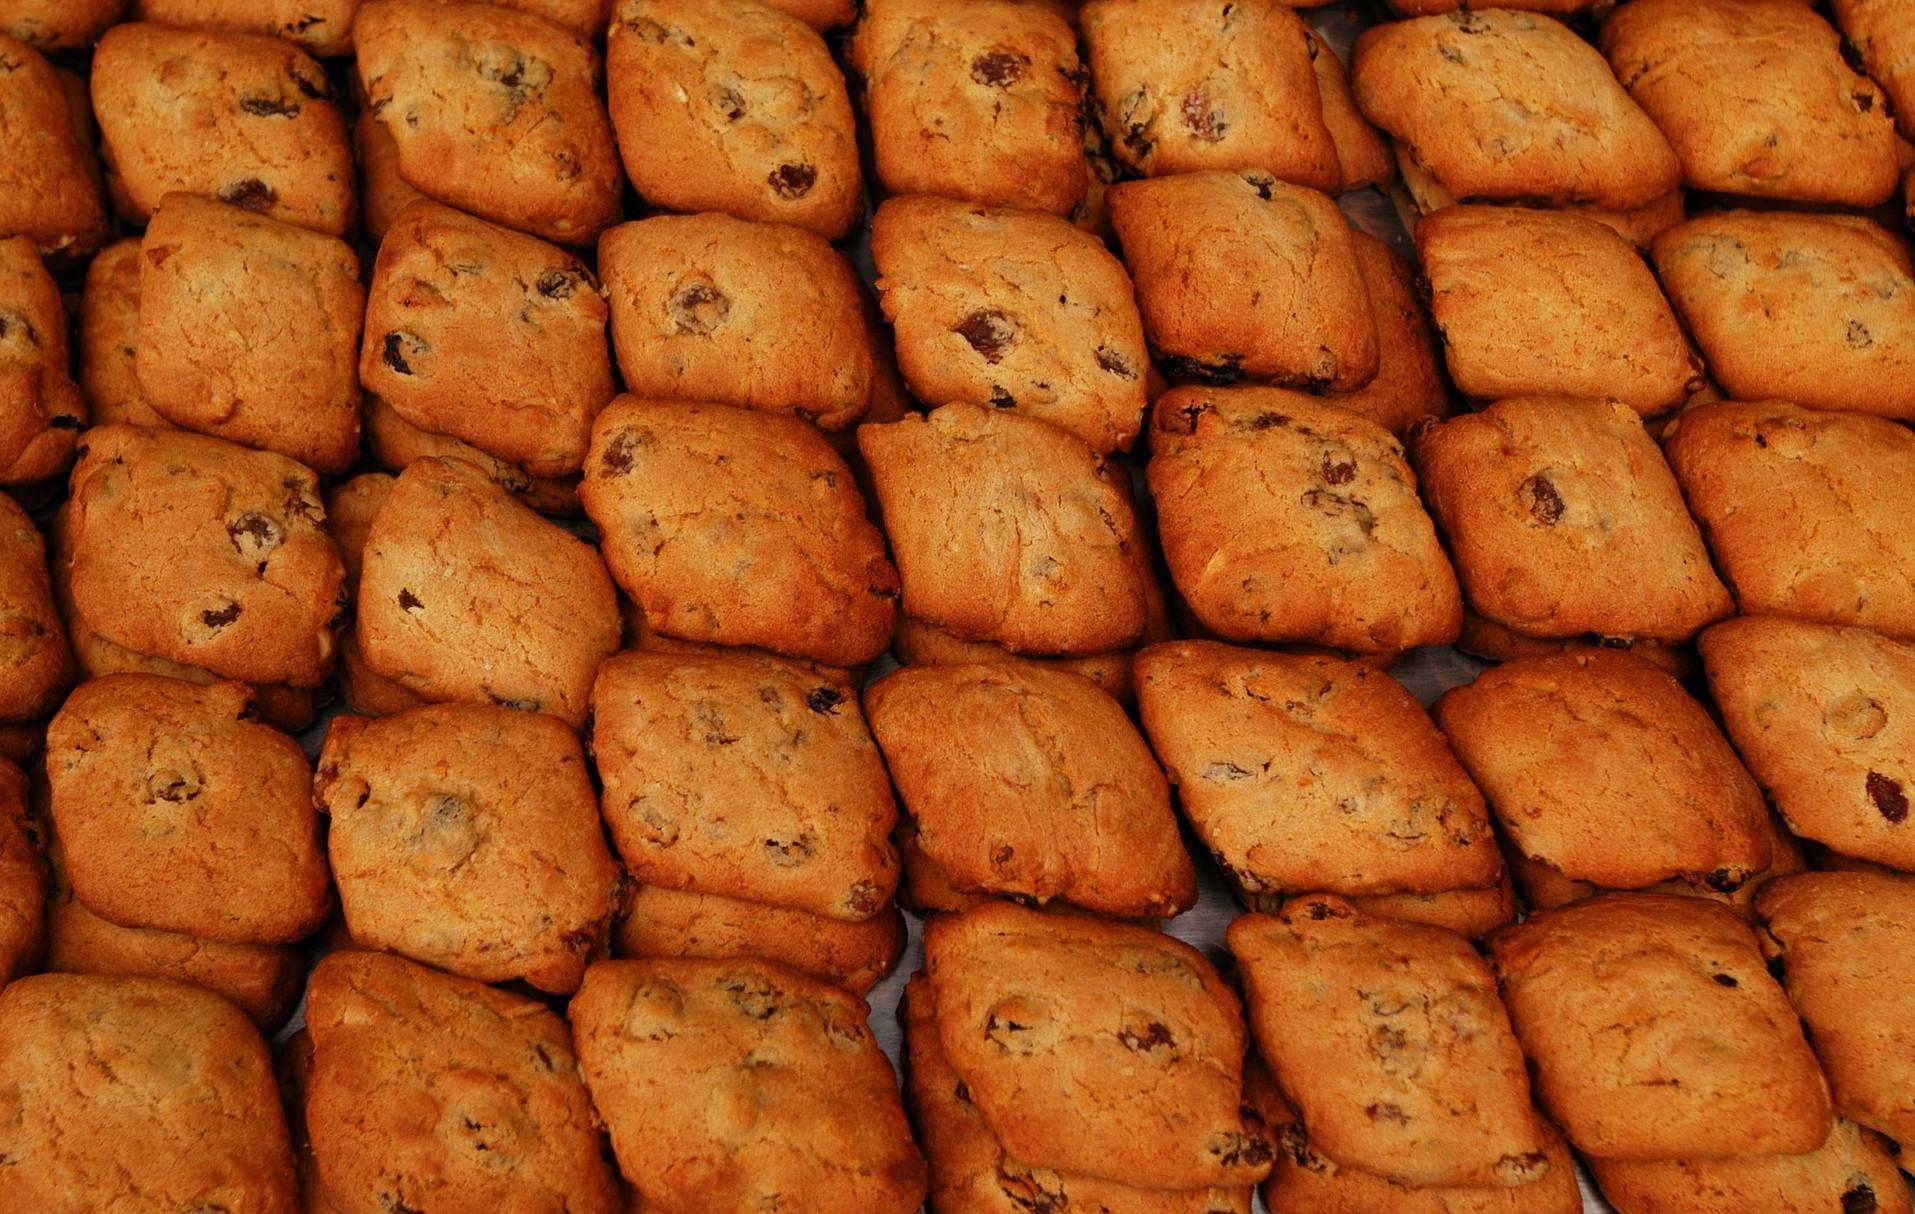 Papassini ricetta originale del dolce tipico sardo di for Ricette dolci sardi